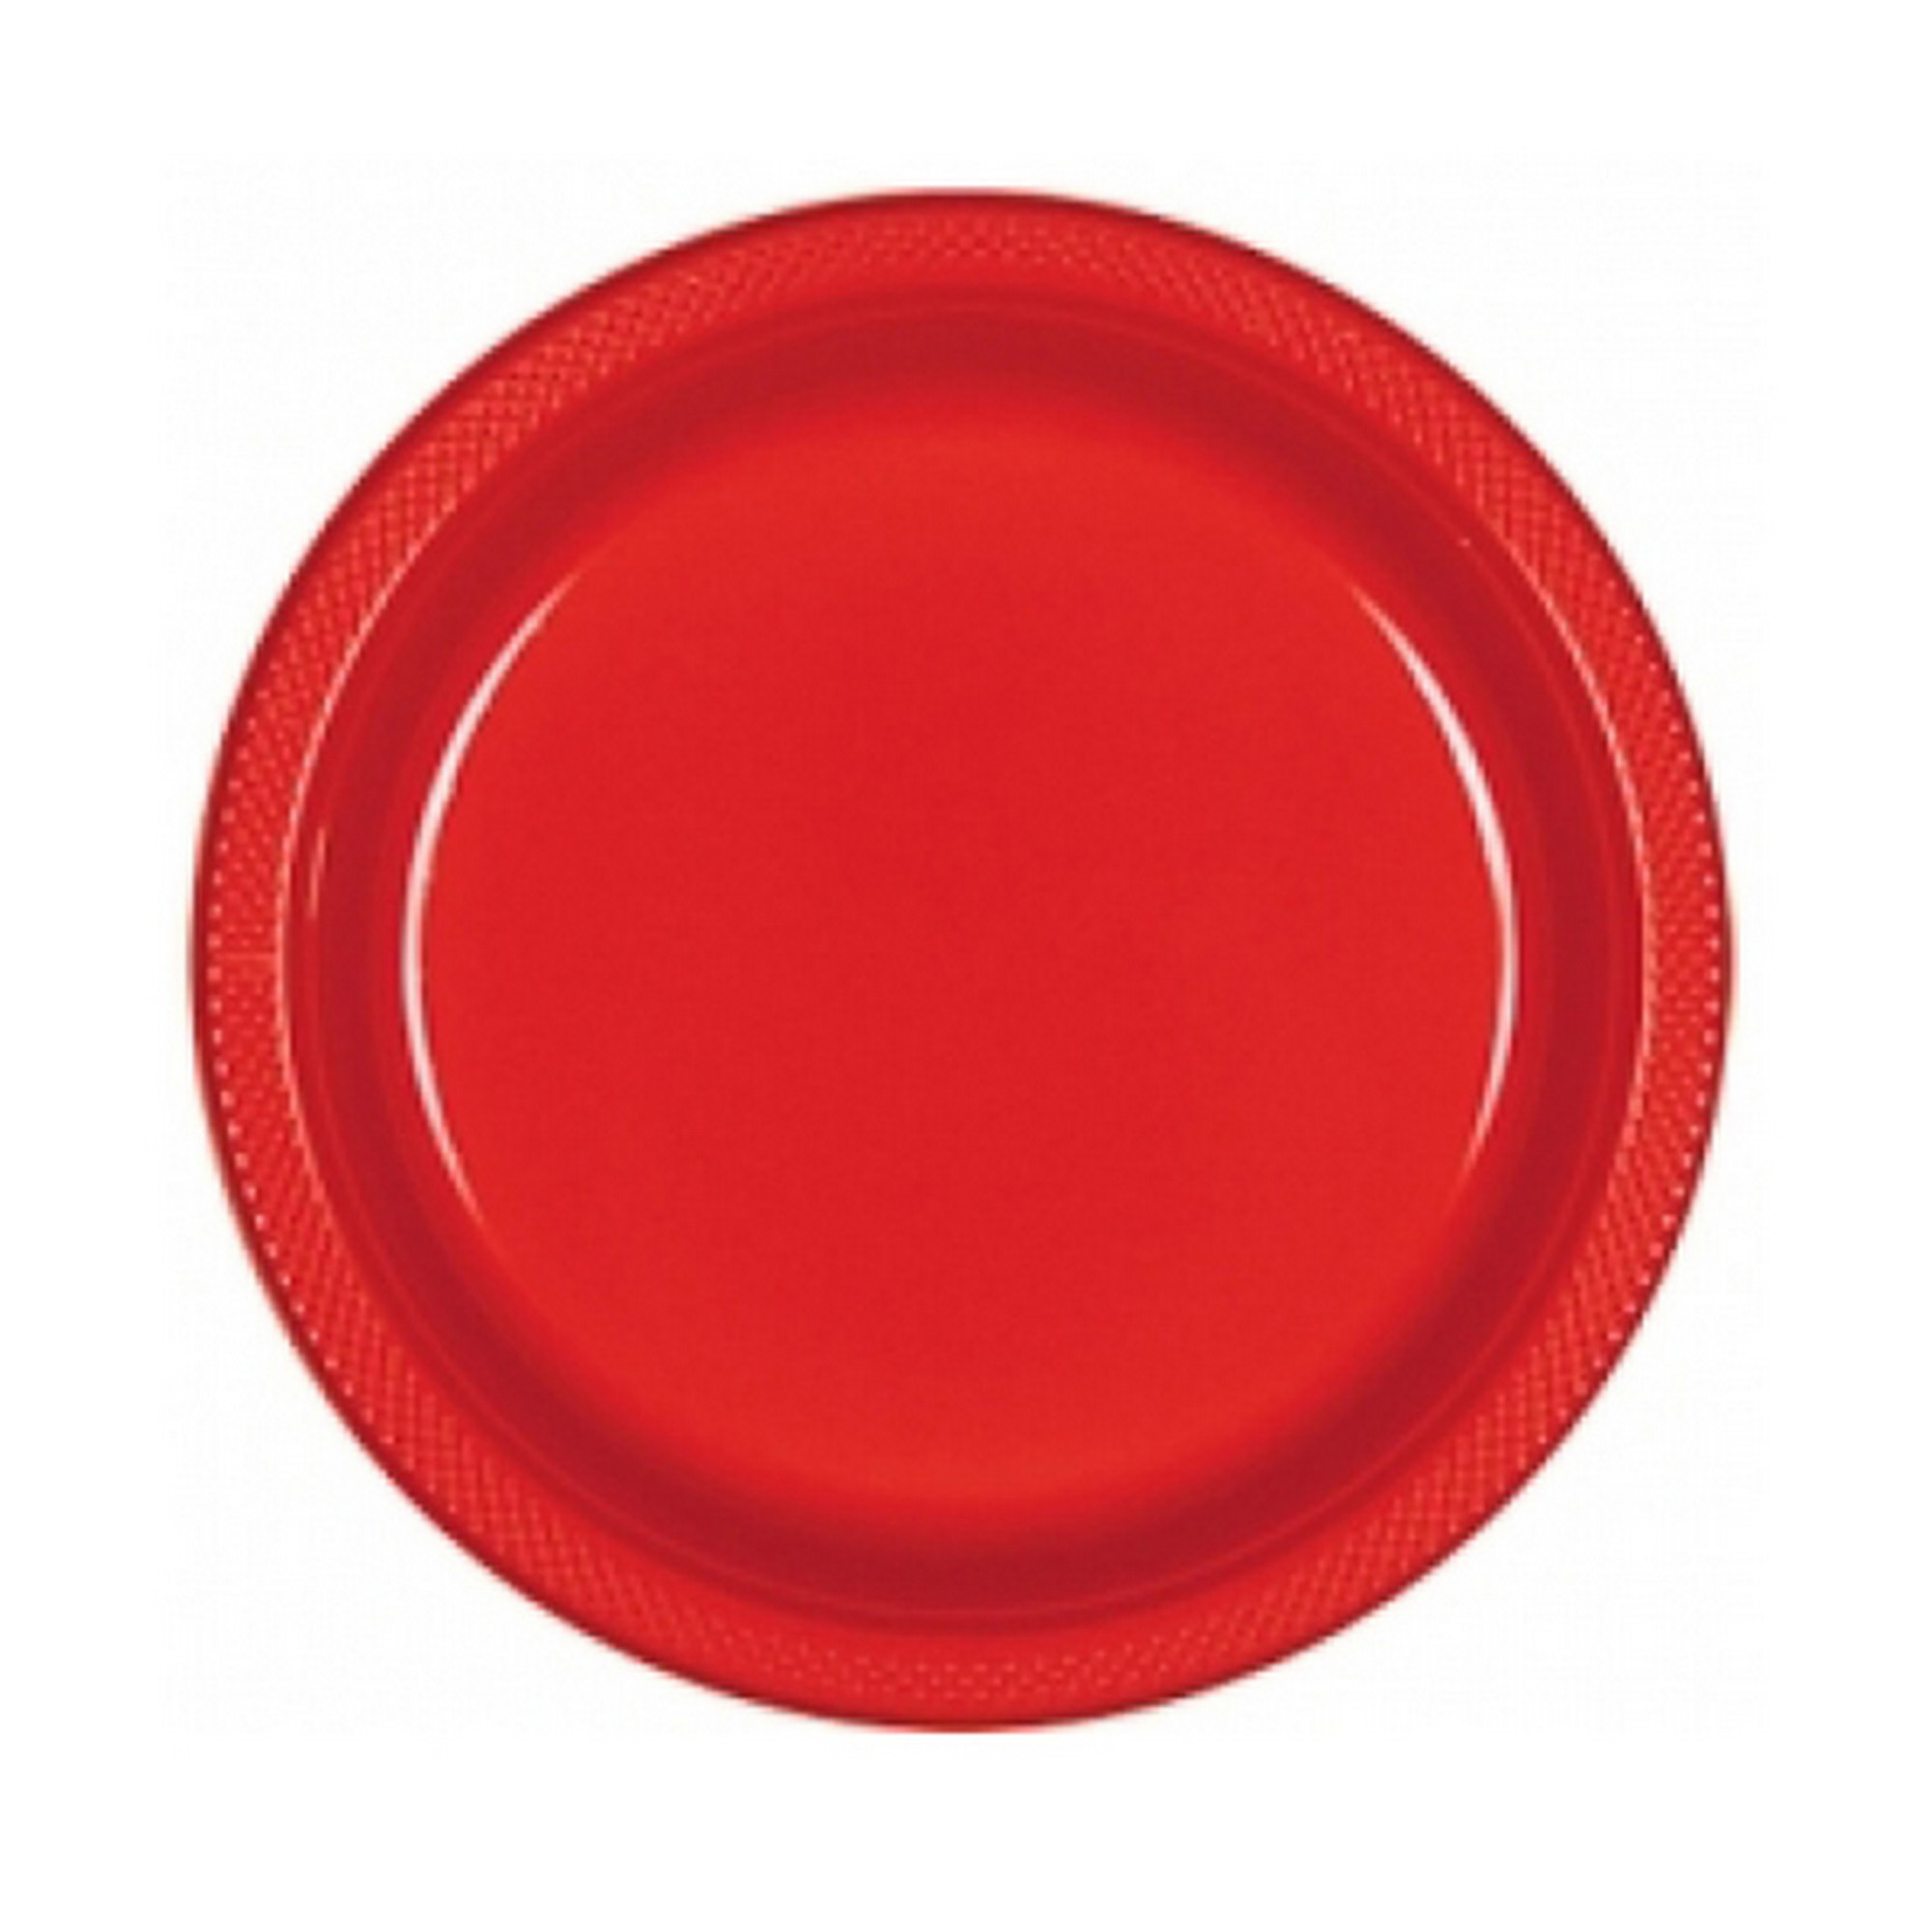 Amscan Plastic Block Color Plastic Plates (Pack Of 20) (SG5905) | eBay